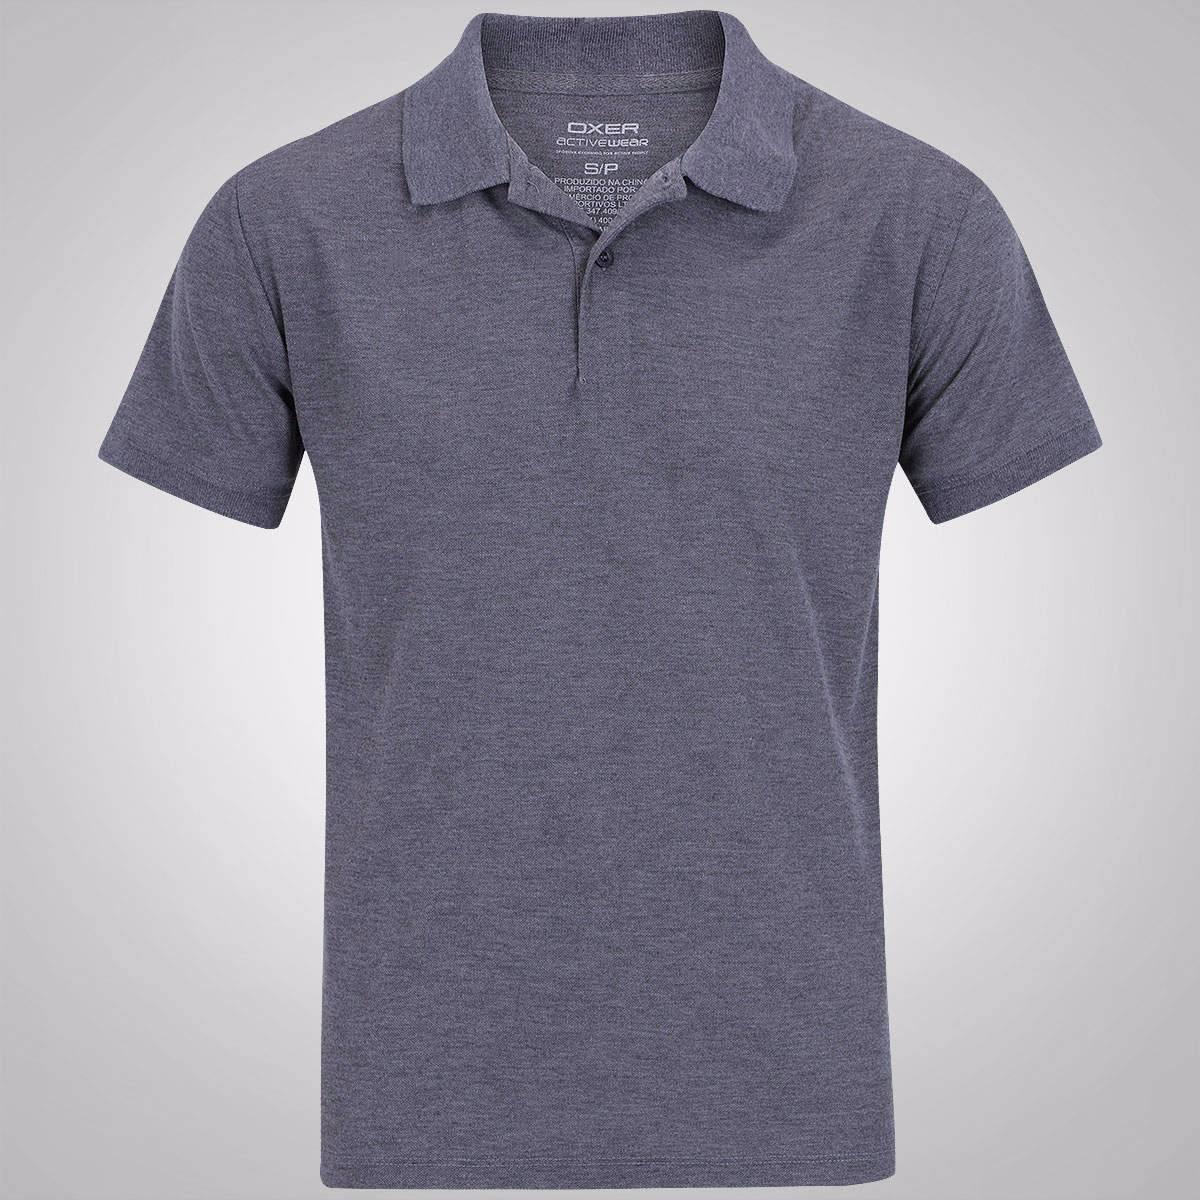 camisa polo piquet lisa cores masculina sem bolso. Carregando zoom. 853c392887073